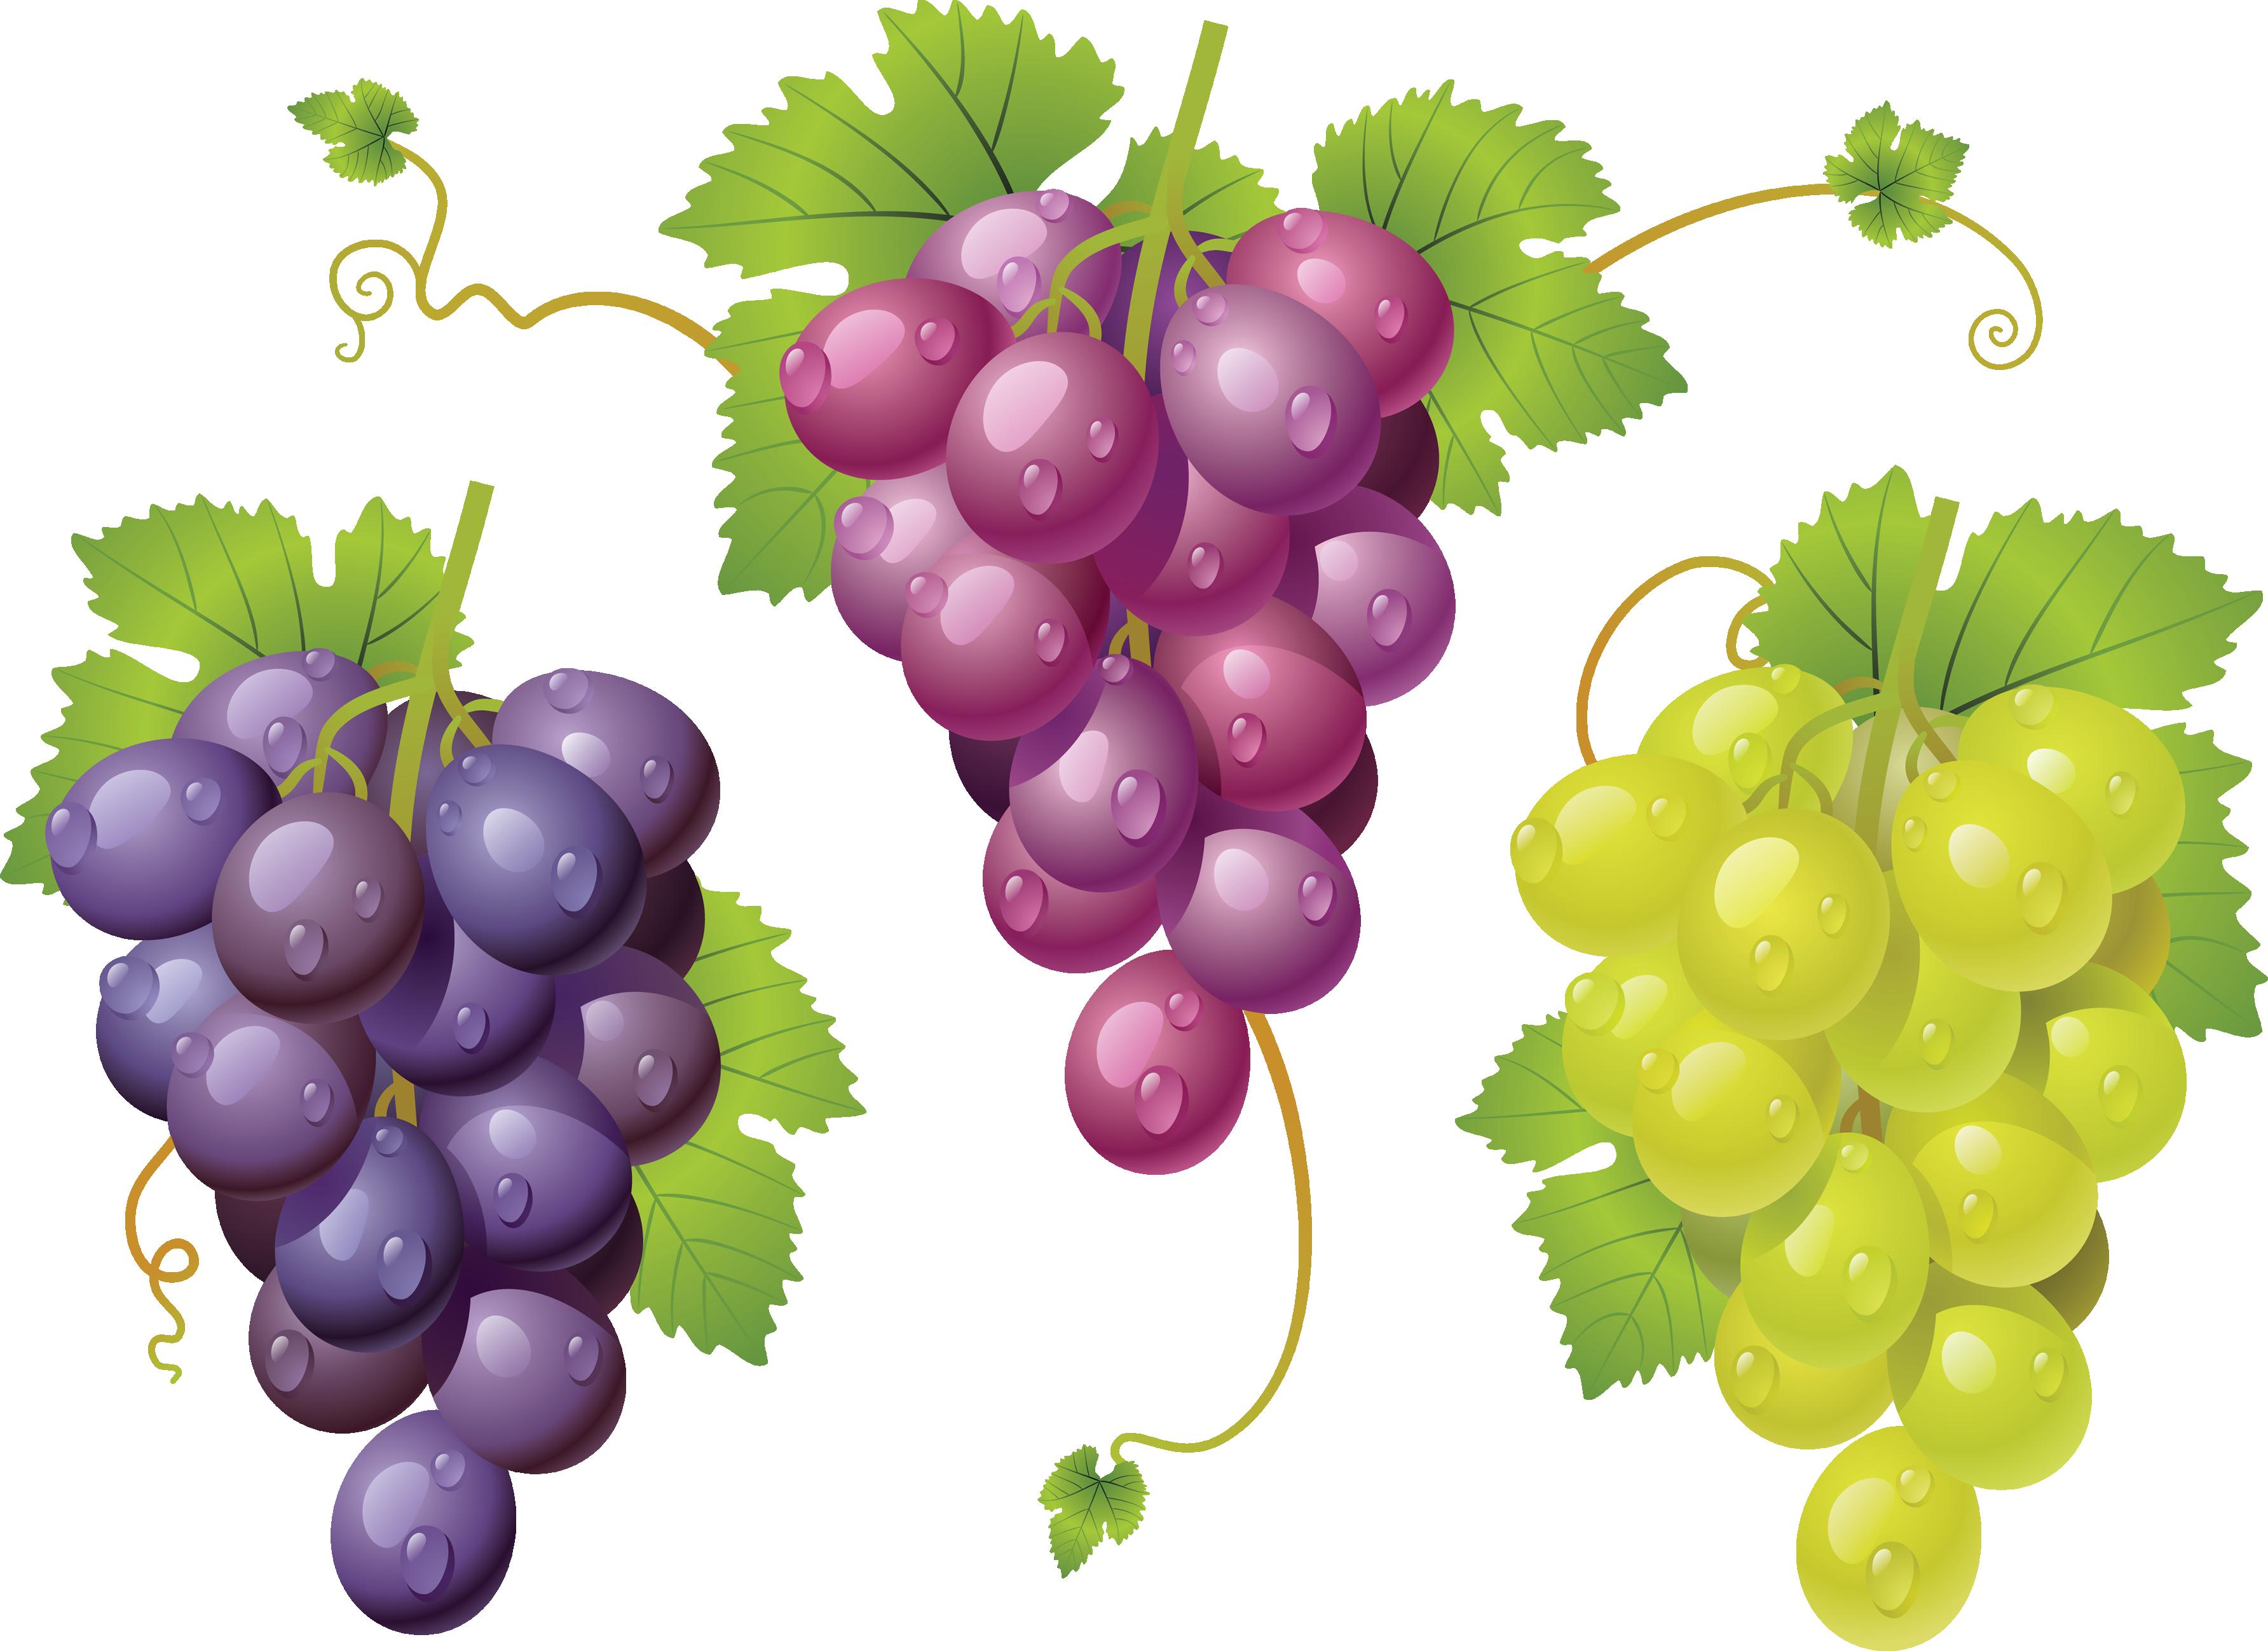 Grapes variations PNG Image